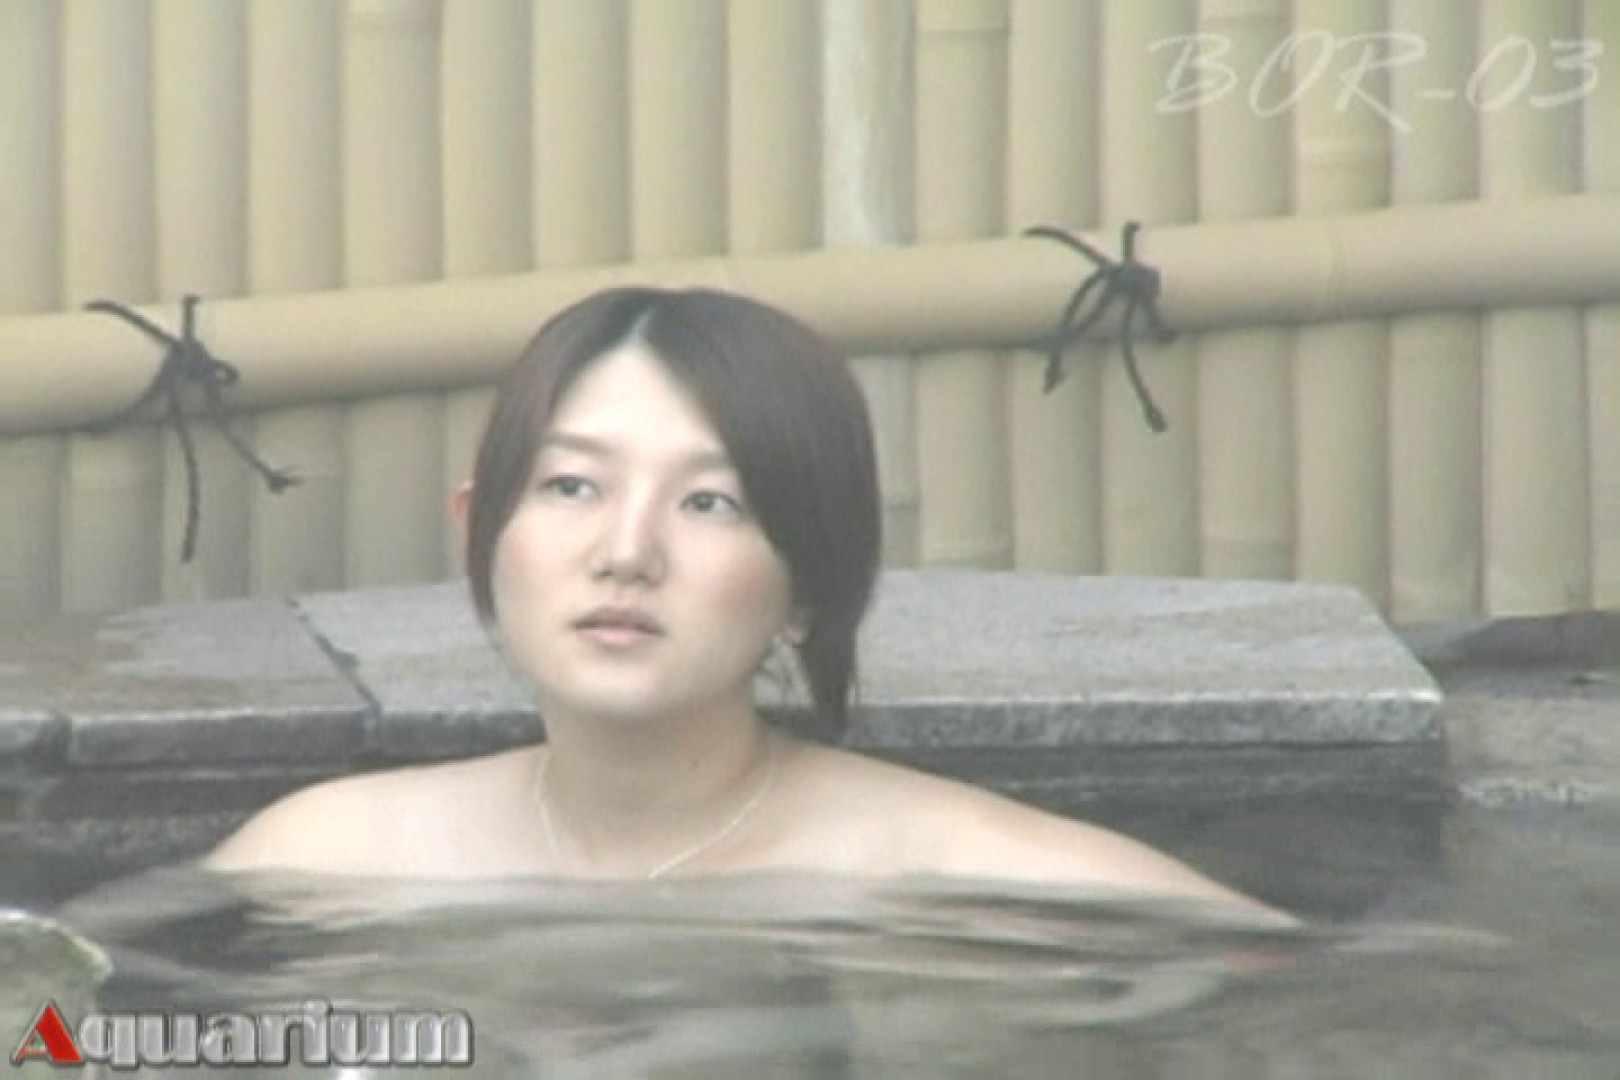 Aquaな露天風呂Vol.487 人気作 エロ無料画像 76PIX 26